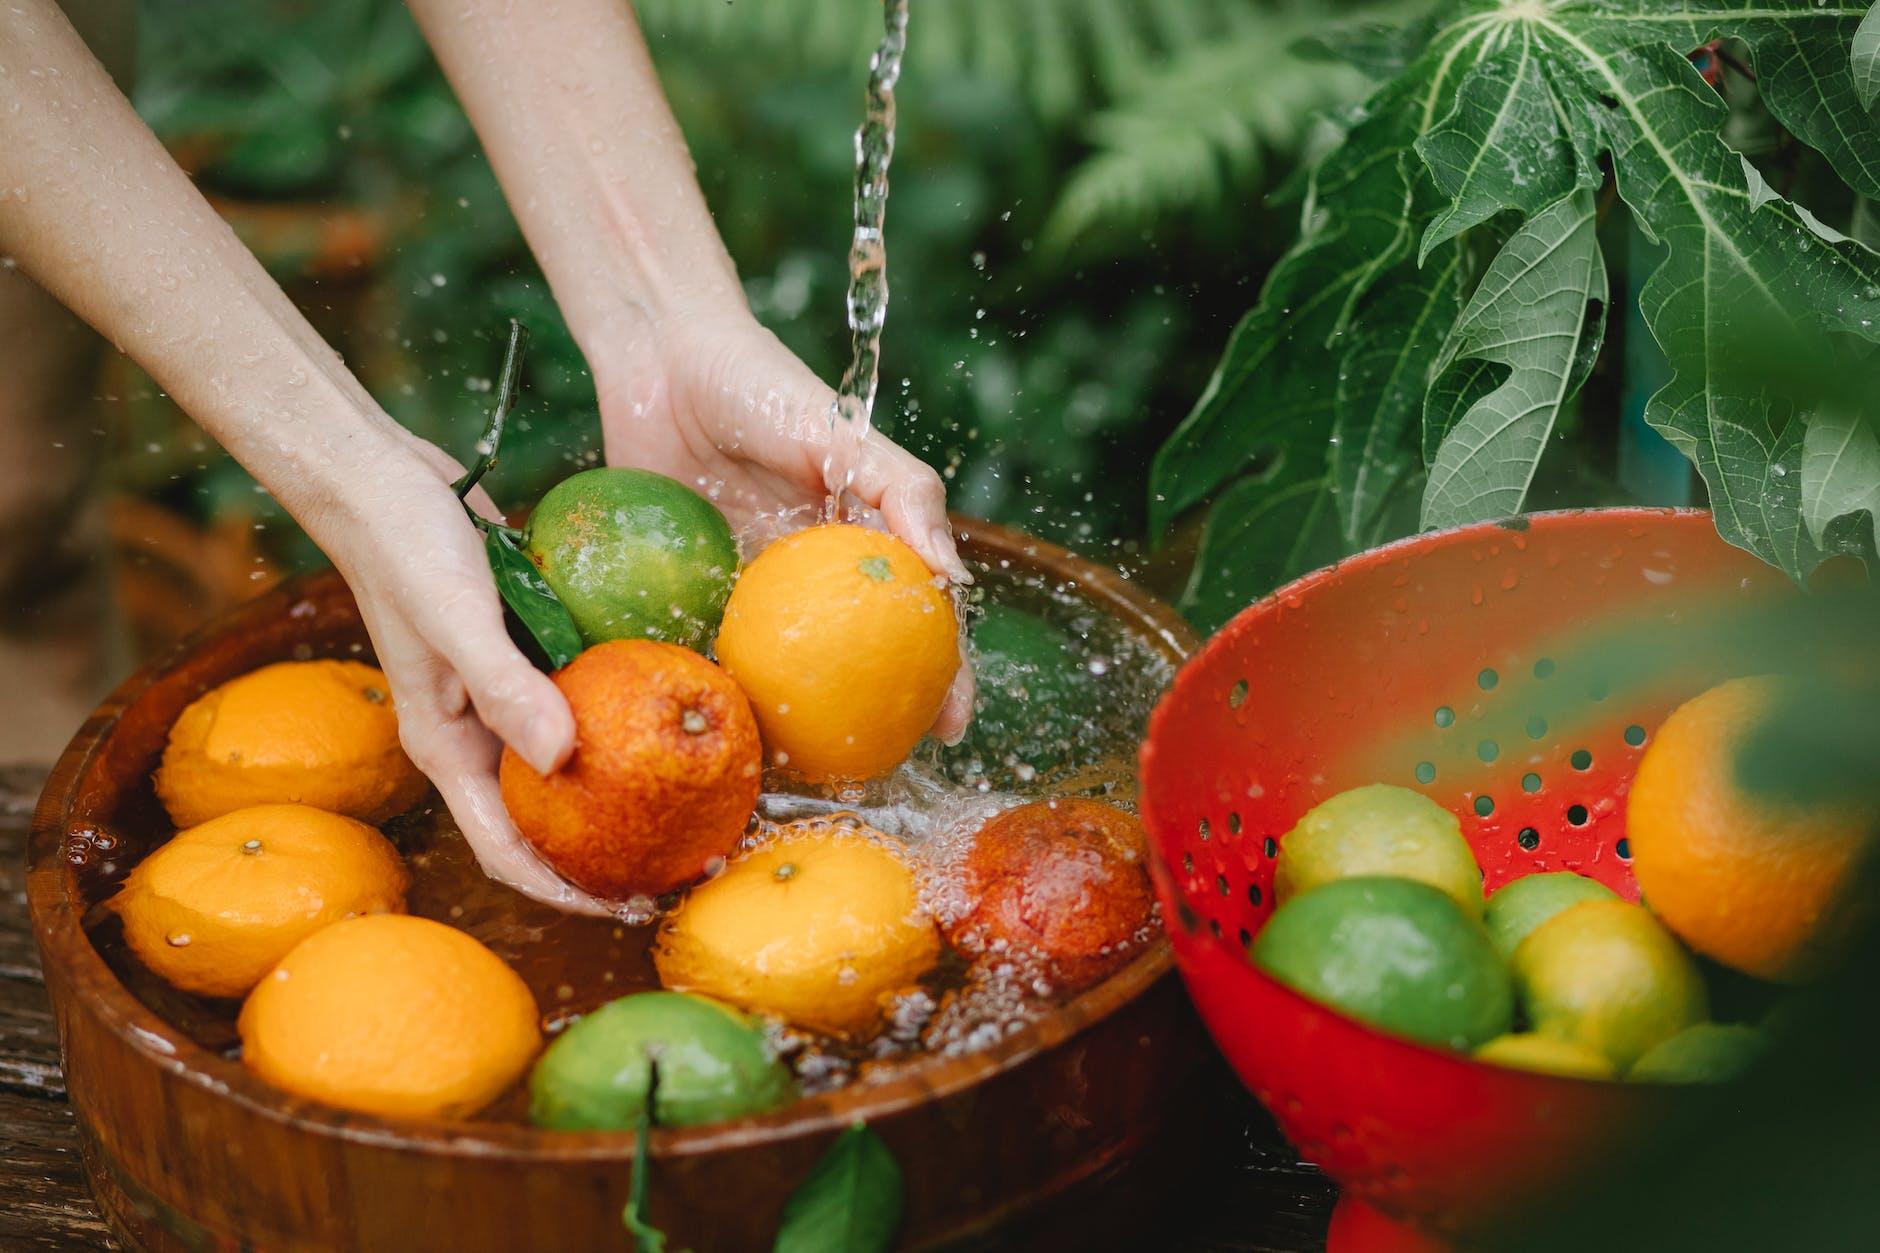 tips mencuci sayur dan buah dibilas